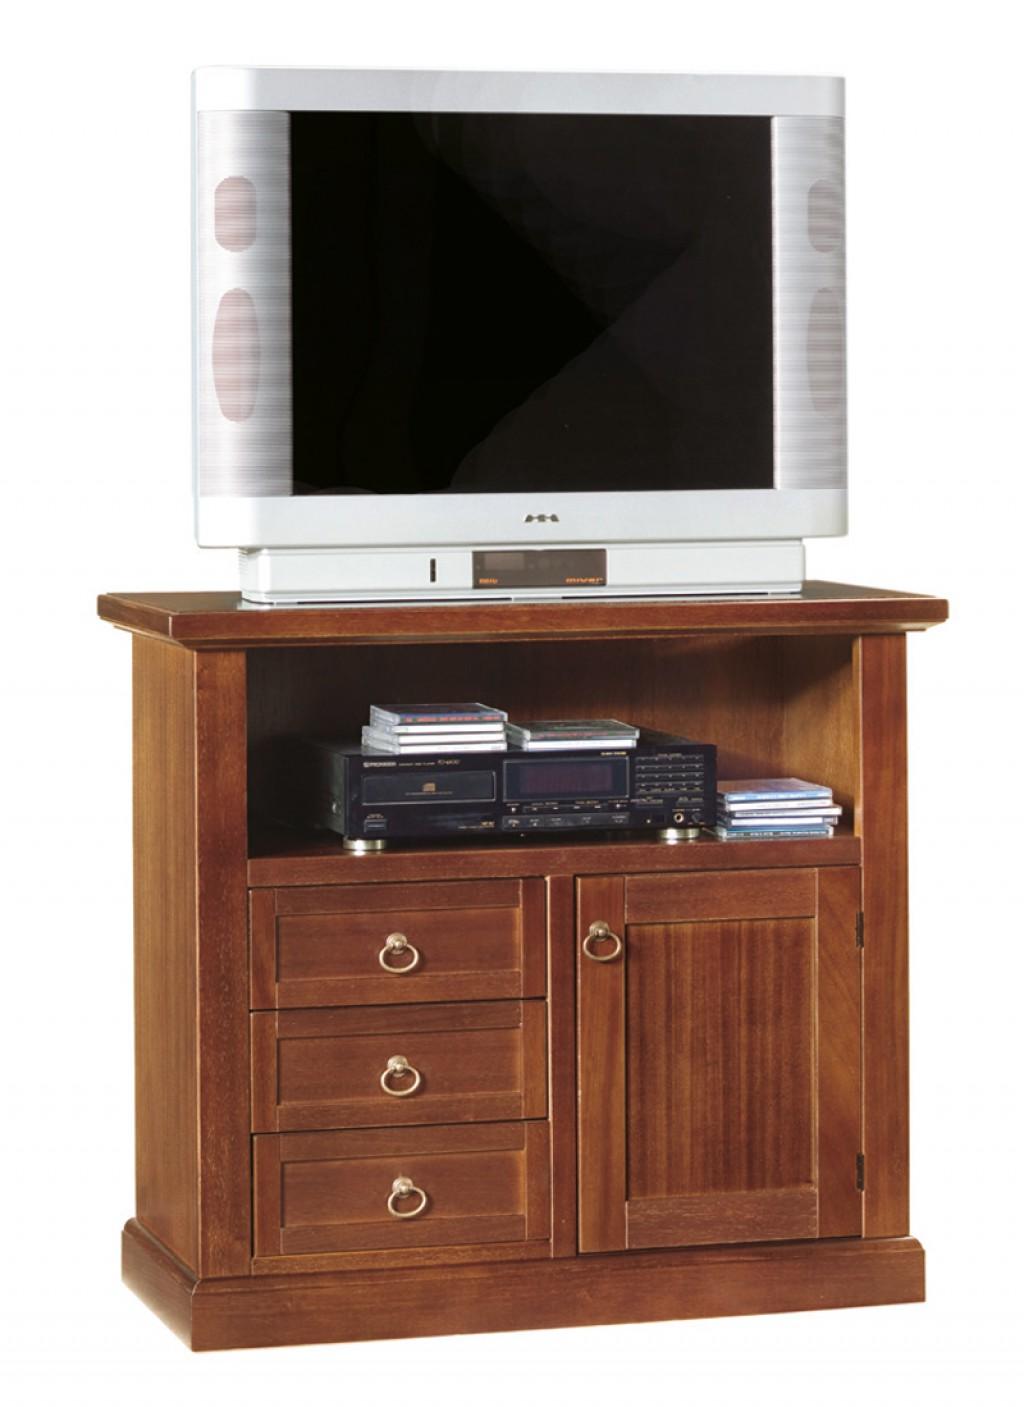 Porta Tv Classico ET378 - Cucine - Mobili di qualità al ...